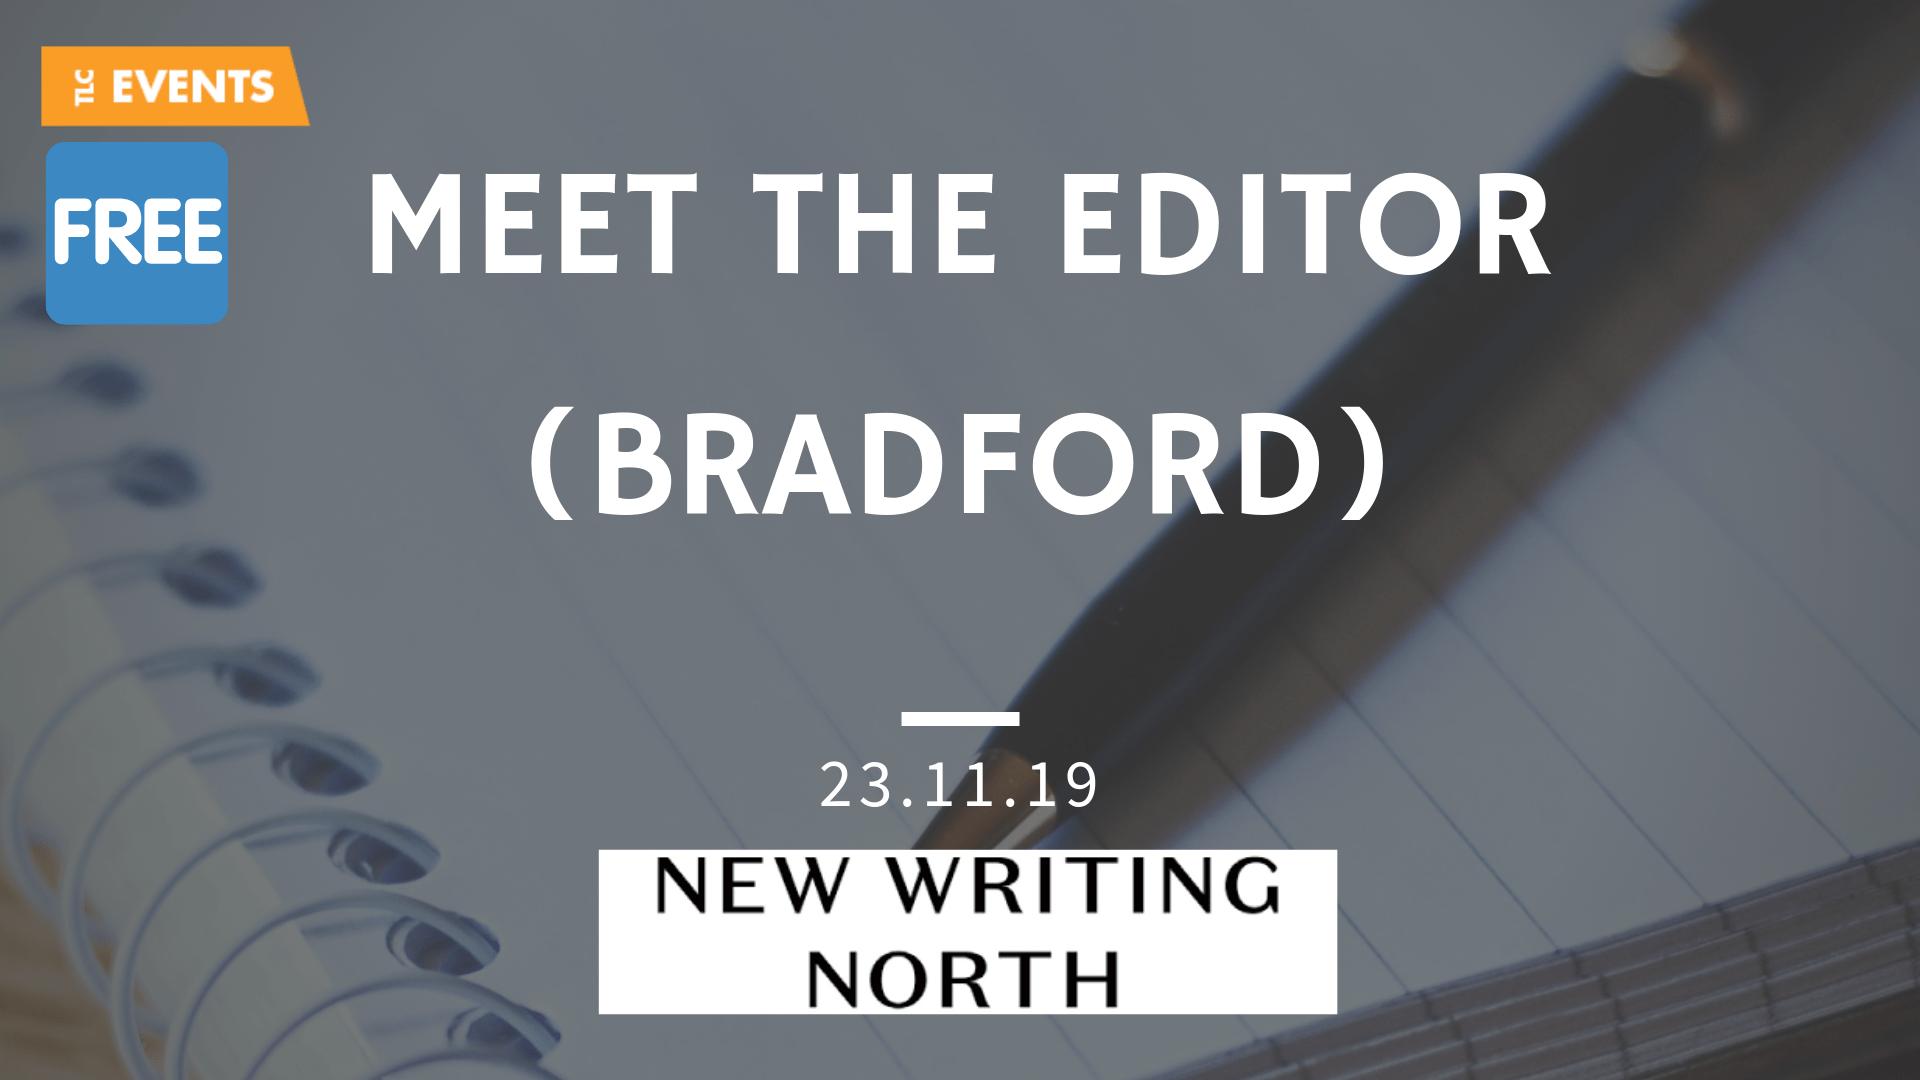 Meet the Editor BRADFORD